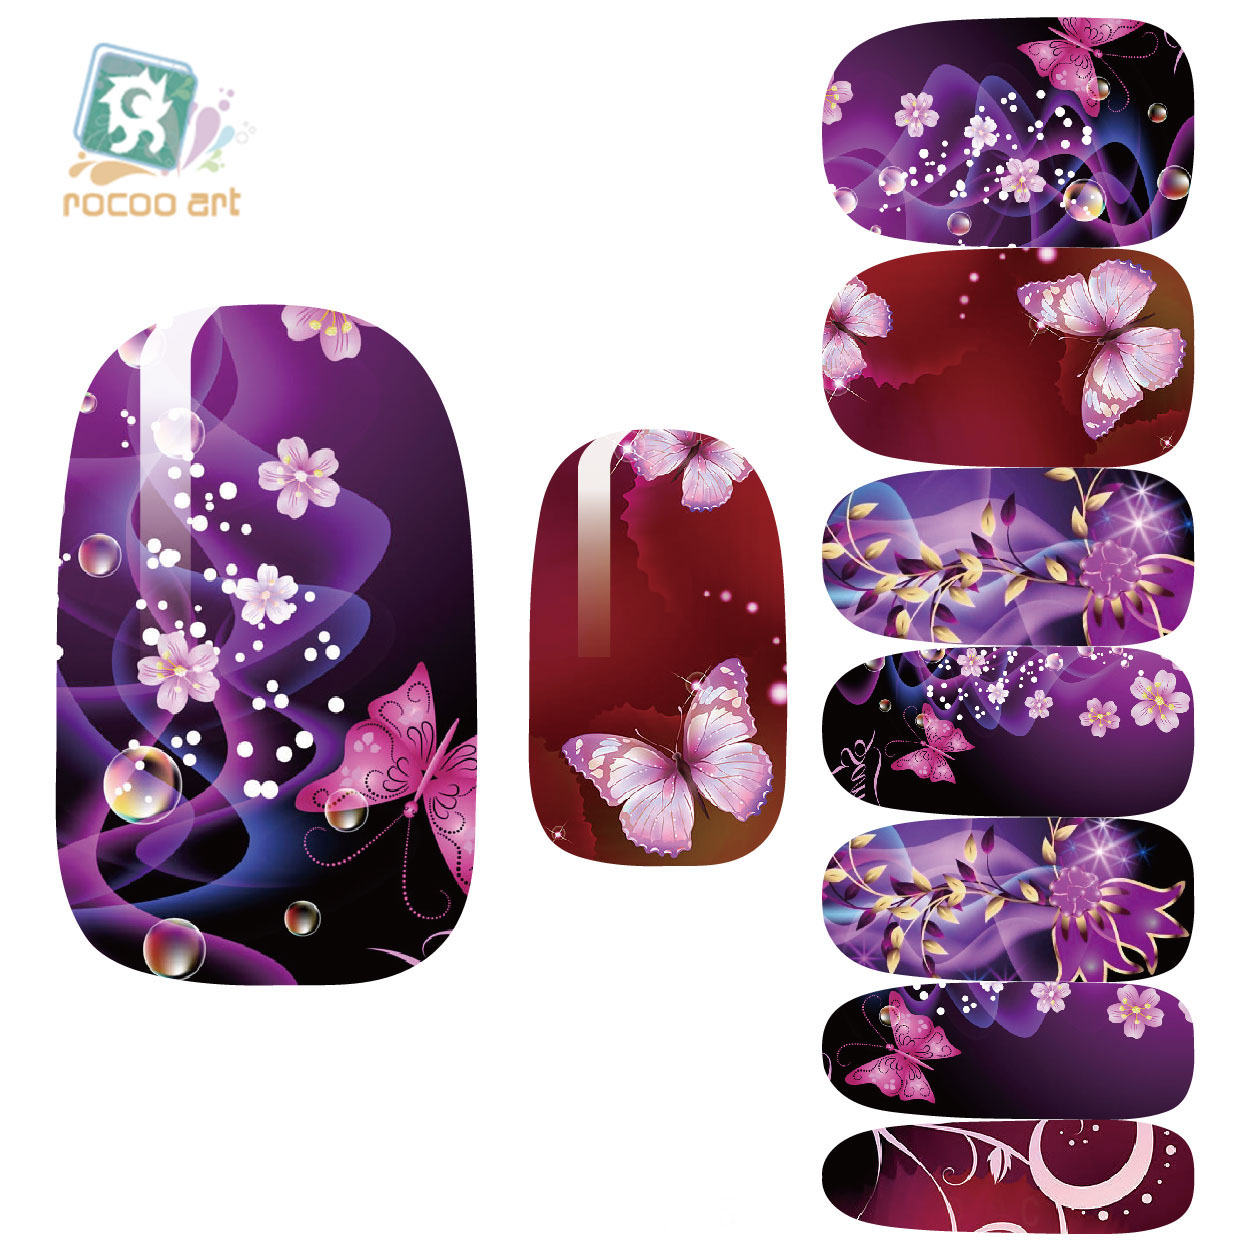 K5671 Newest Water Transfer Nail Foil Sticker Art Sexy Flirtatious Purple Shine Flowers Nail Wraps Sticker Manicure Decals